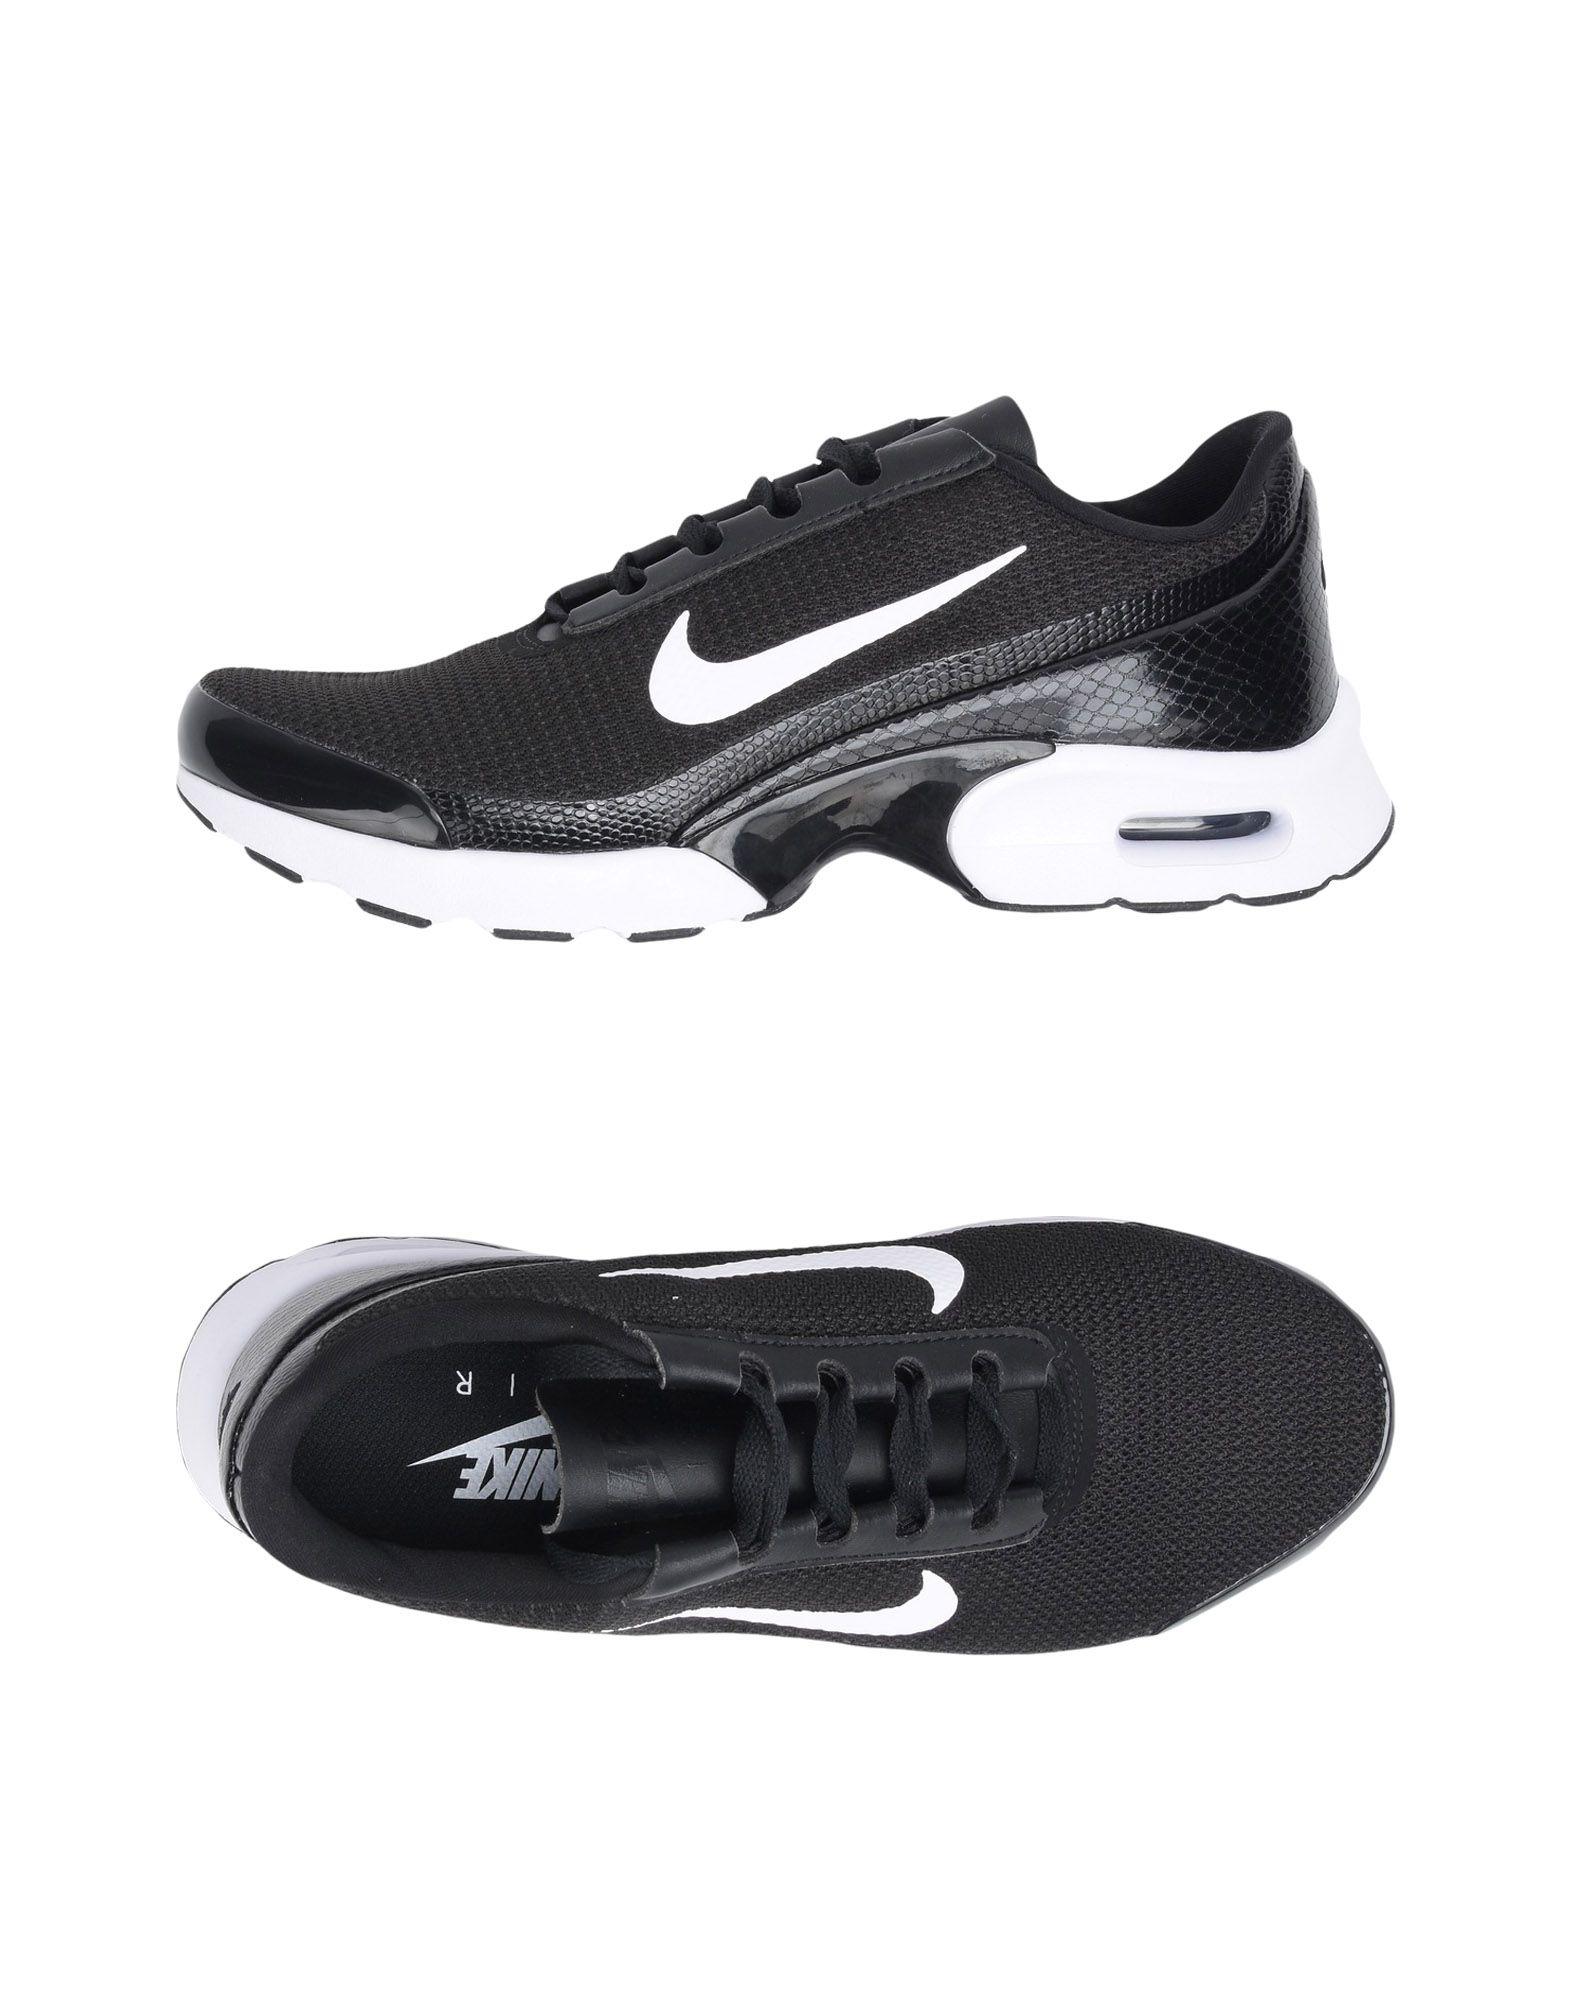 Nike 11438809XD   Air Max Jewell  11438809XD Nike Gute Qualität beliebte Schuhe 700311